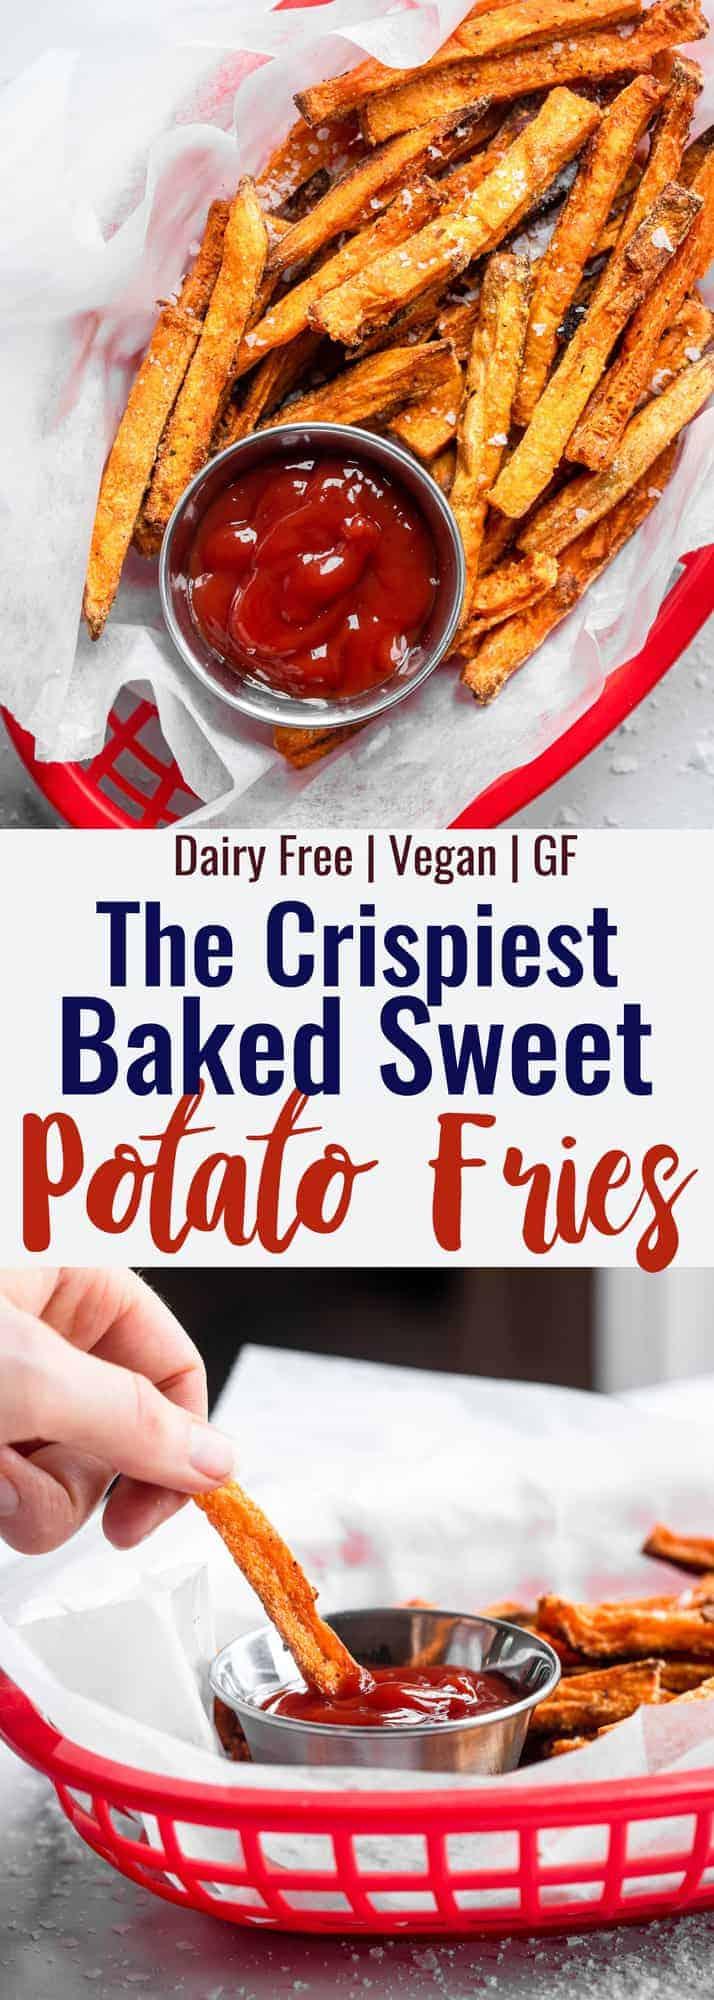 baked sweet potato fries collage photo